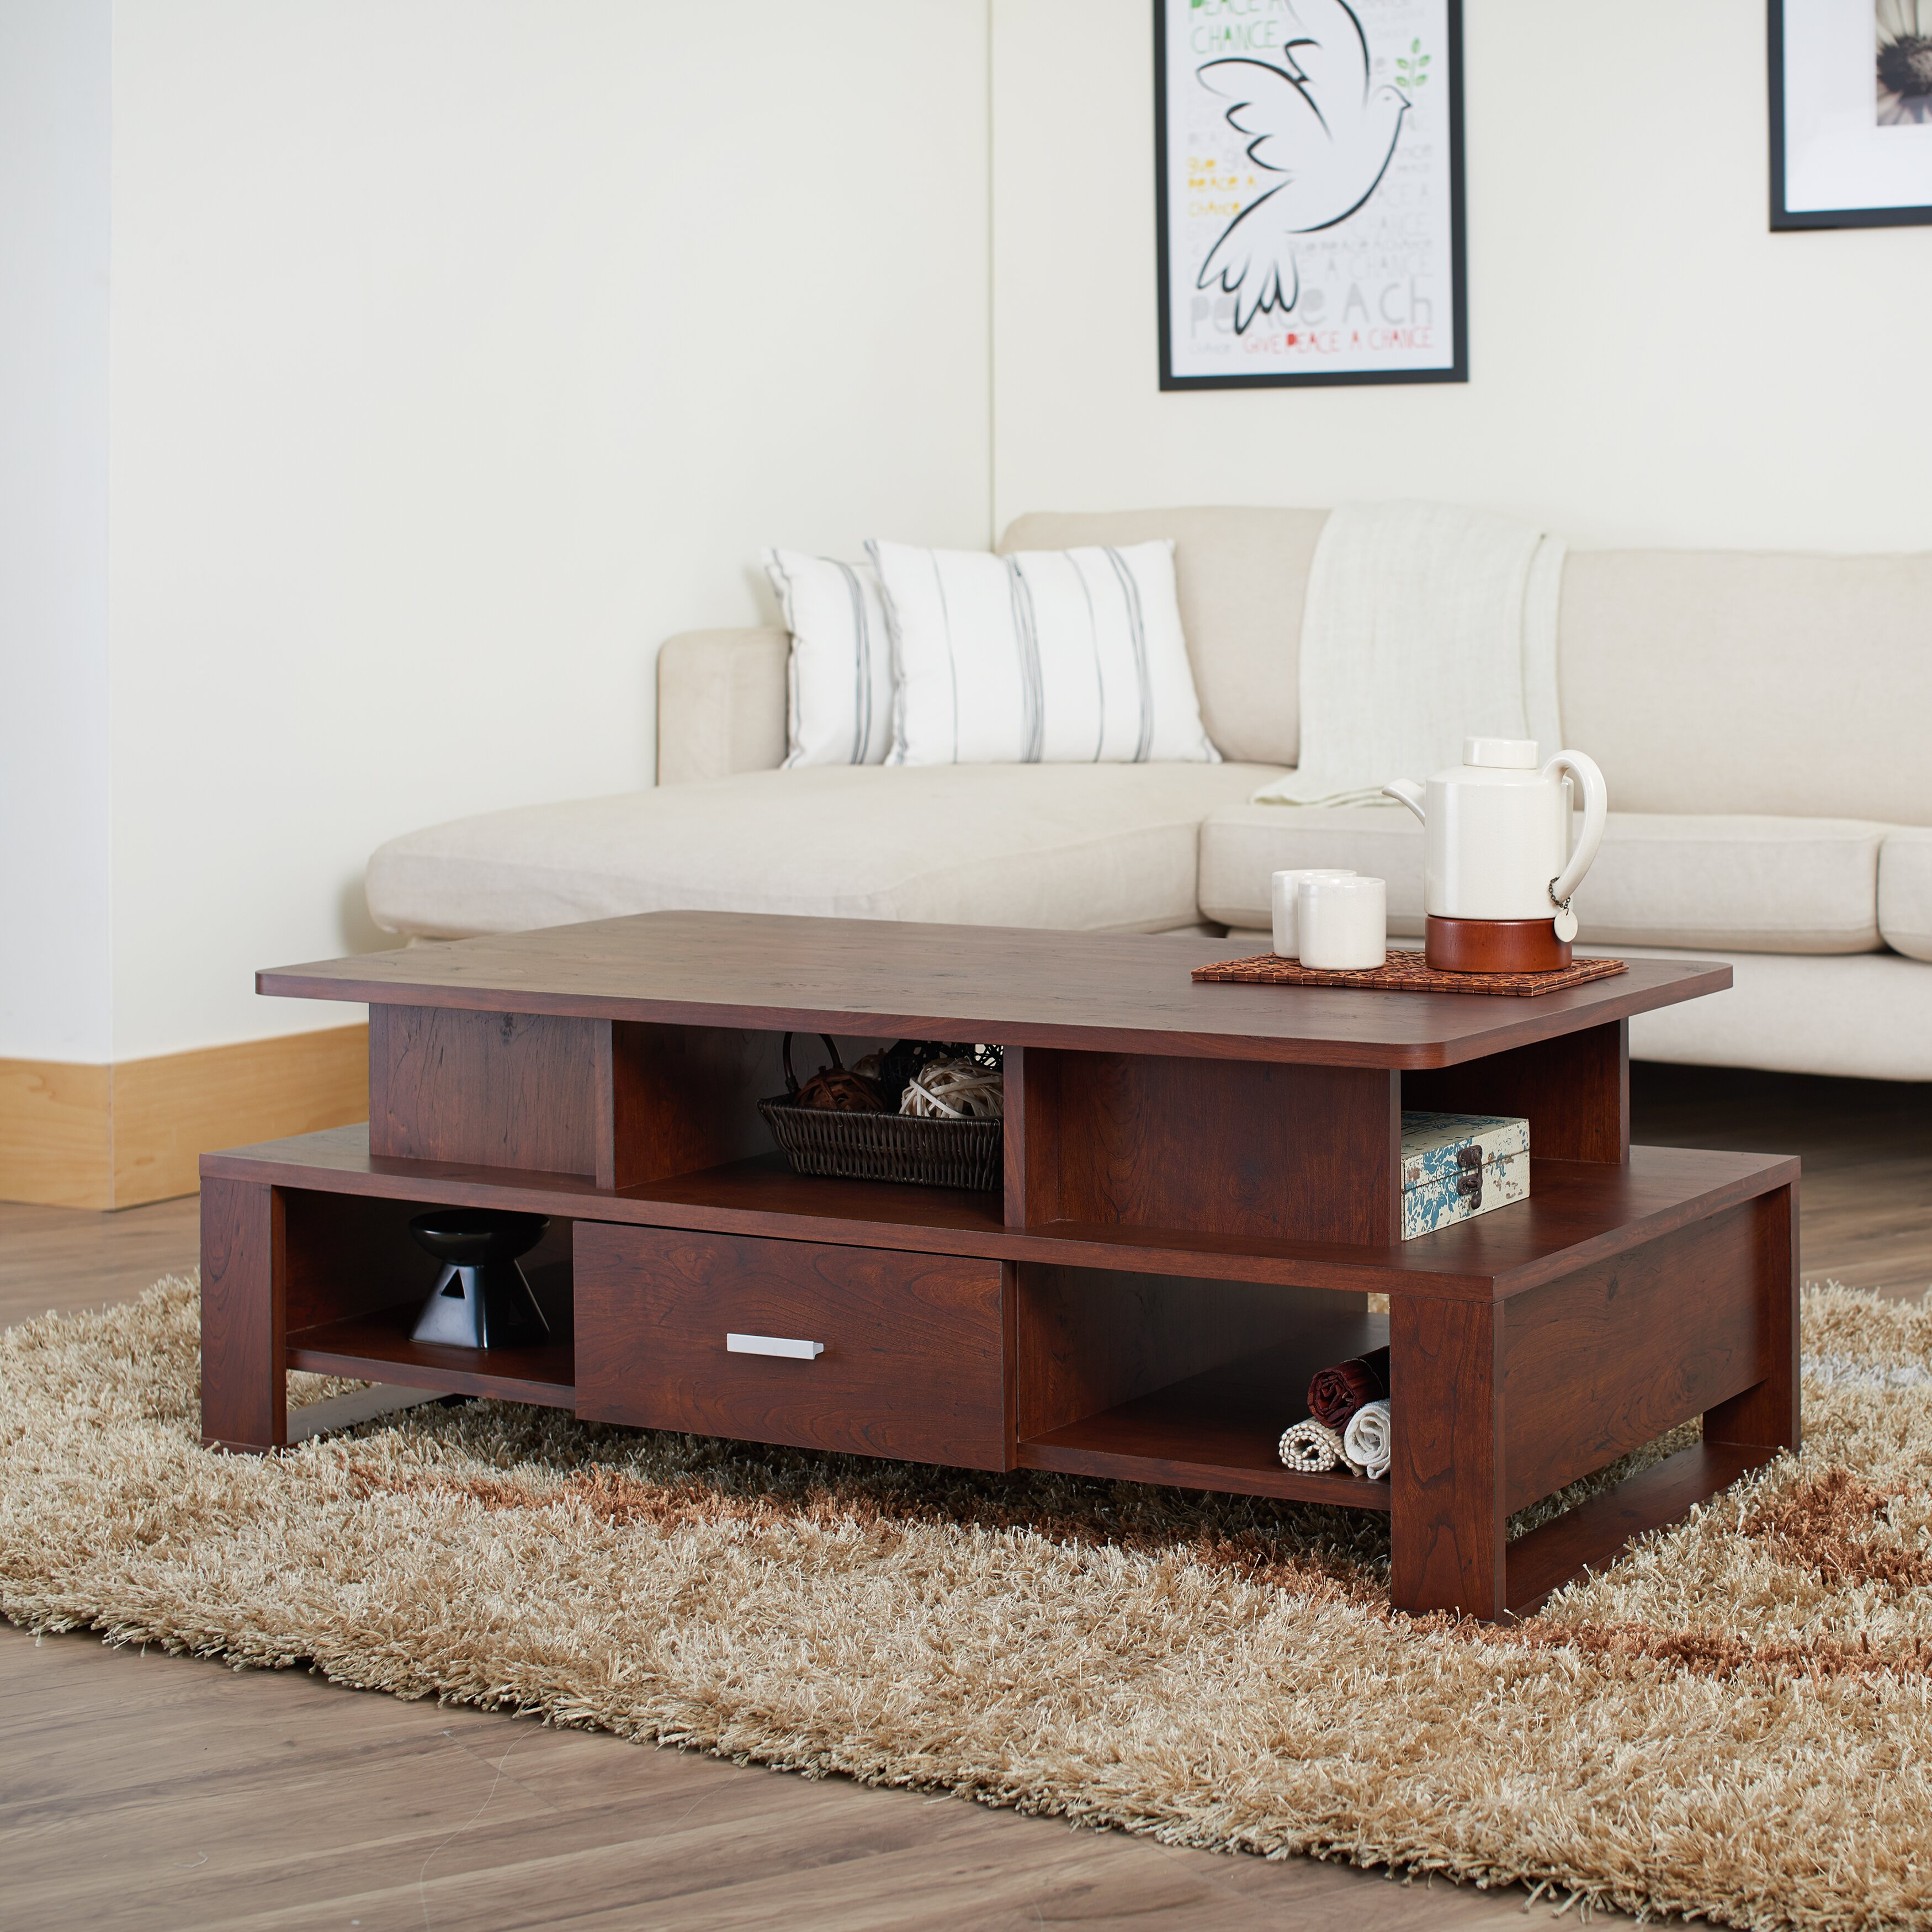 Hokku designs alexzana coffee table reviews wayfair for Hokku designs living room furniture